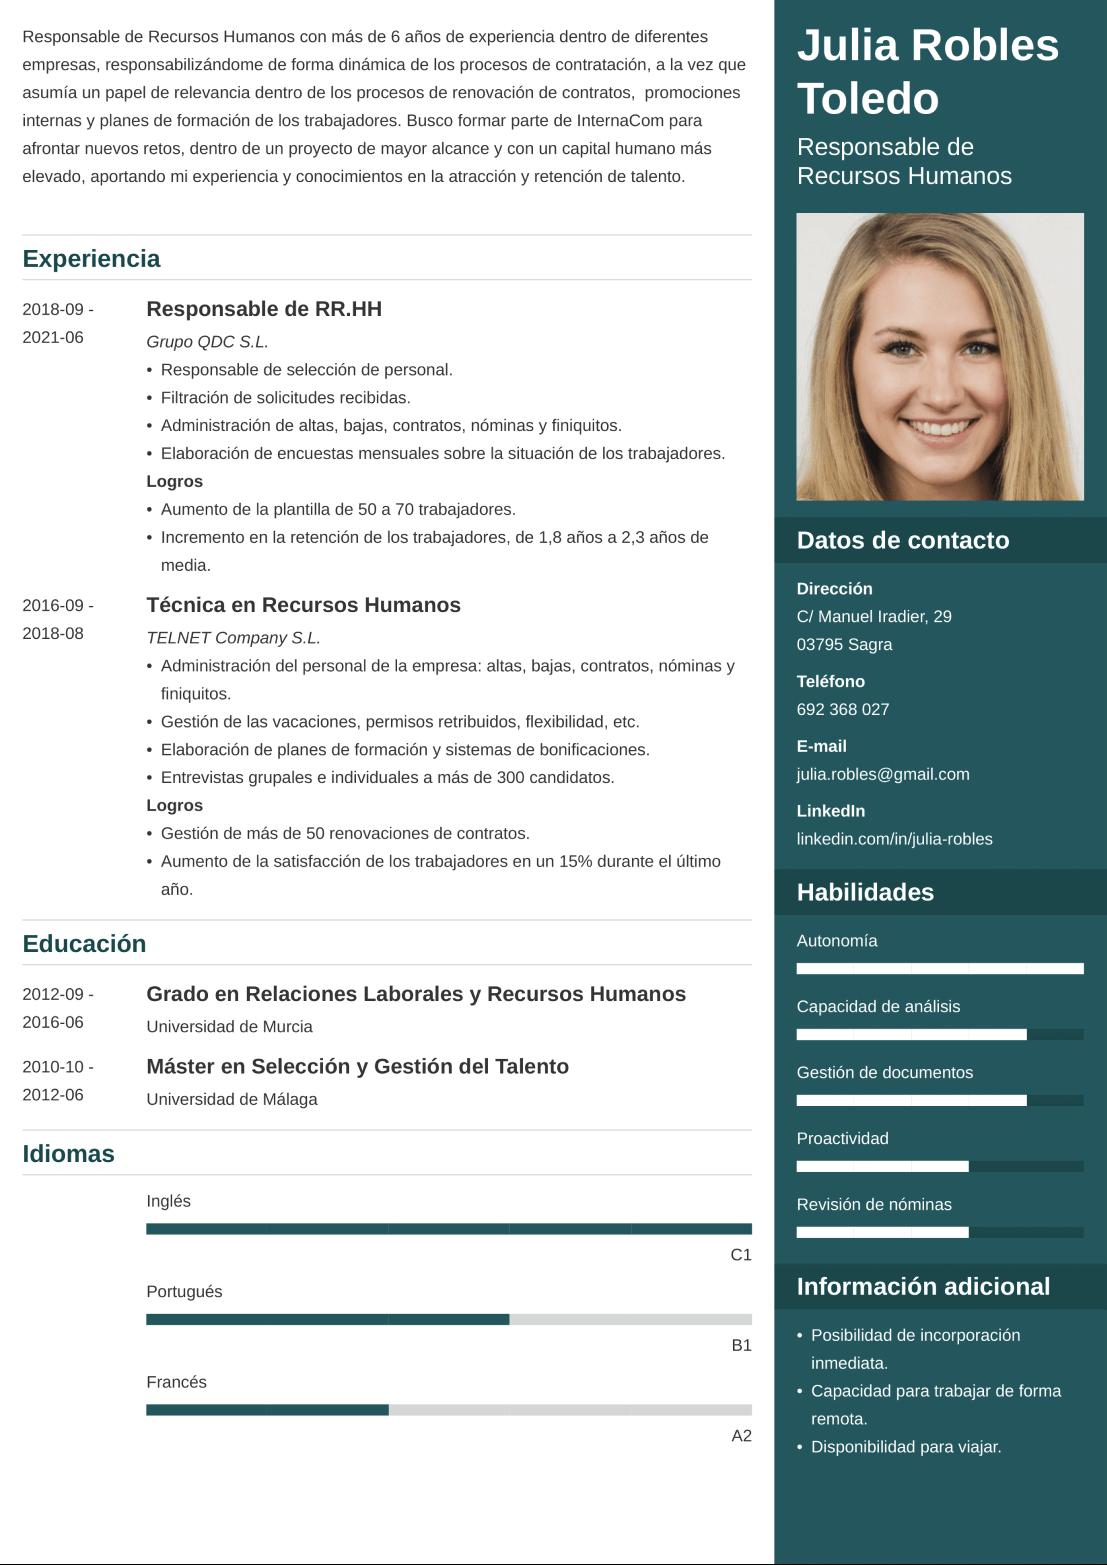 CV online enfold